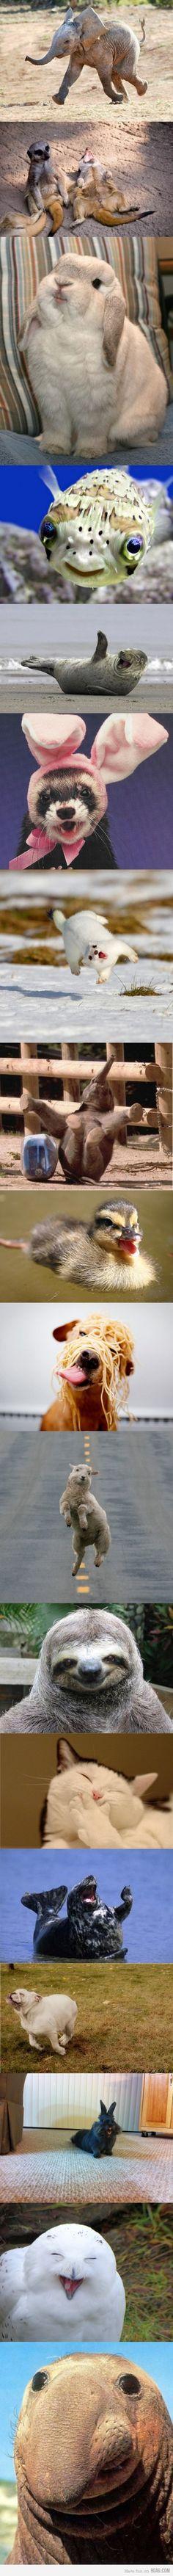 world's happiest animals!